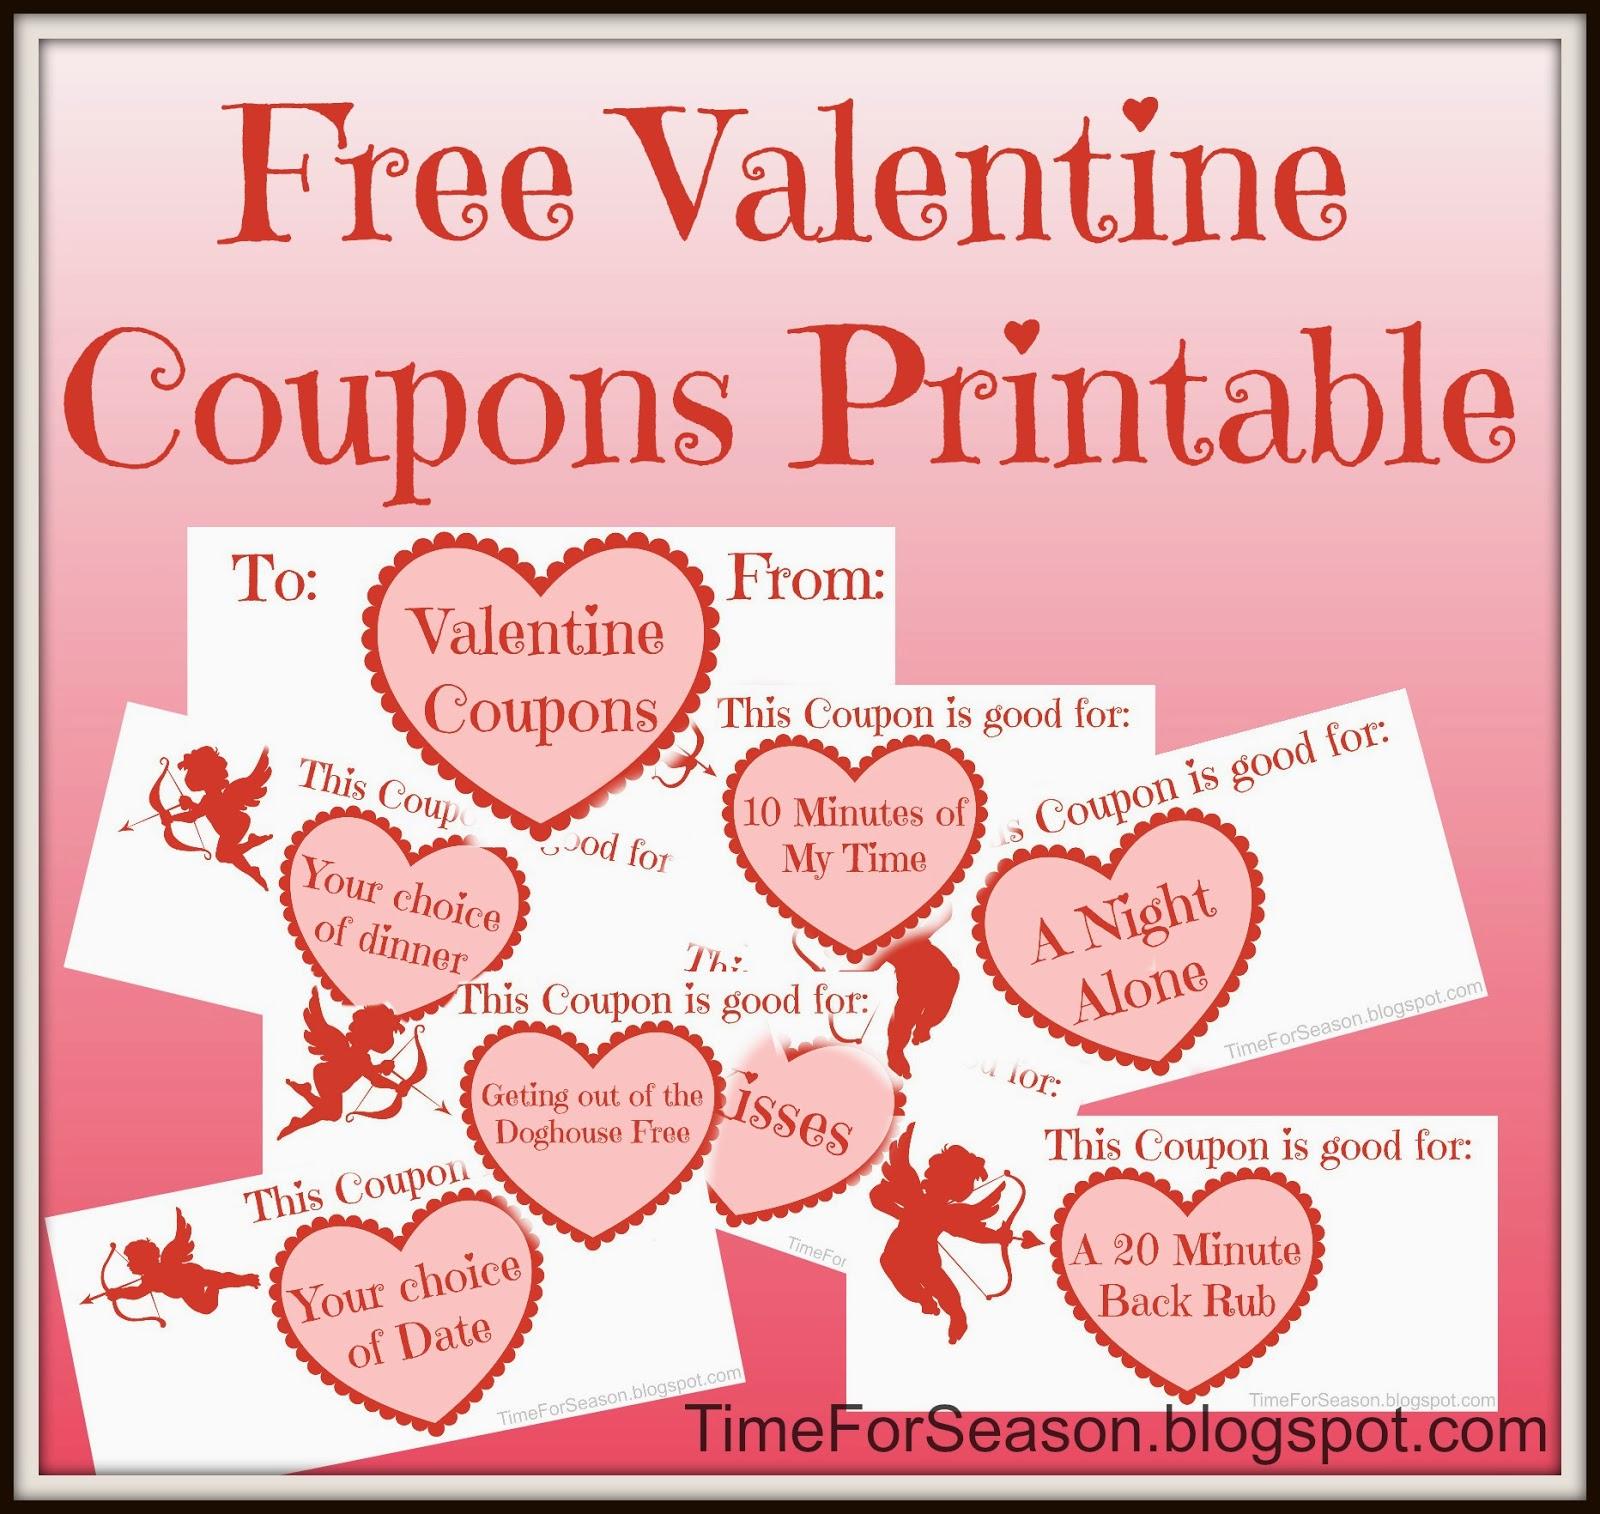 Valentine Coupons - Free Printable - Free Printable Coupons 2014